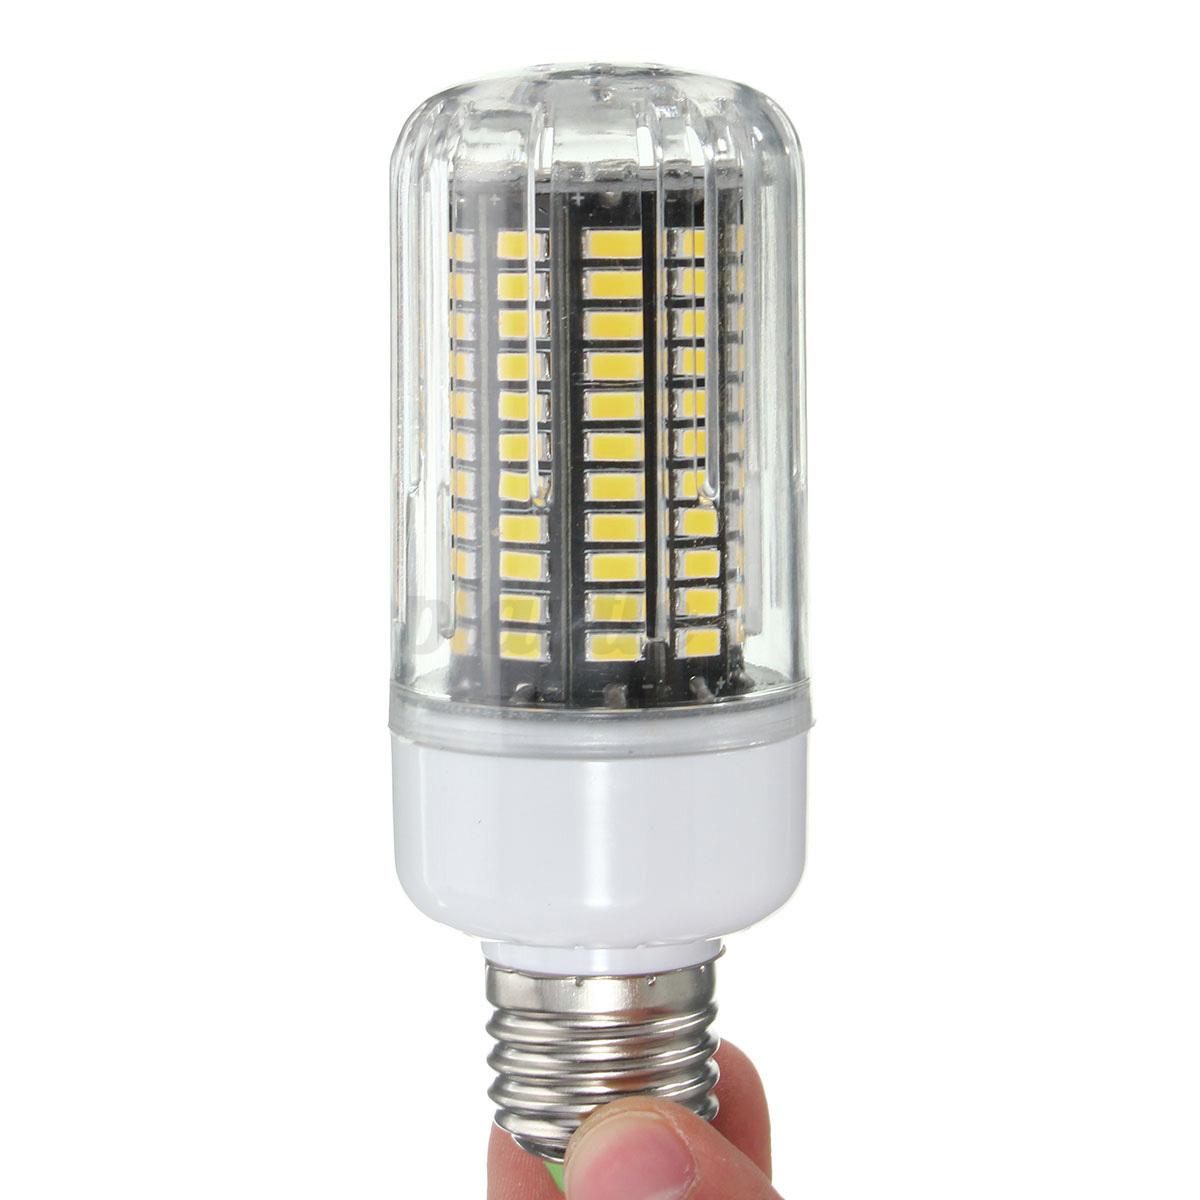 e27 e14 e12 e17 gu10 b22 5736 smd 40 140 led corn light. Black Bedroom Furniture Sets. Home Design Ideas